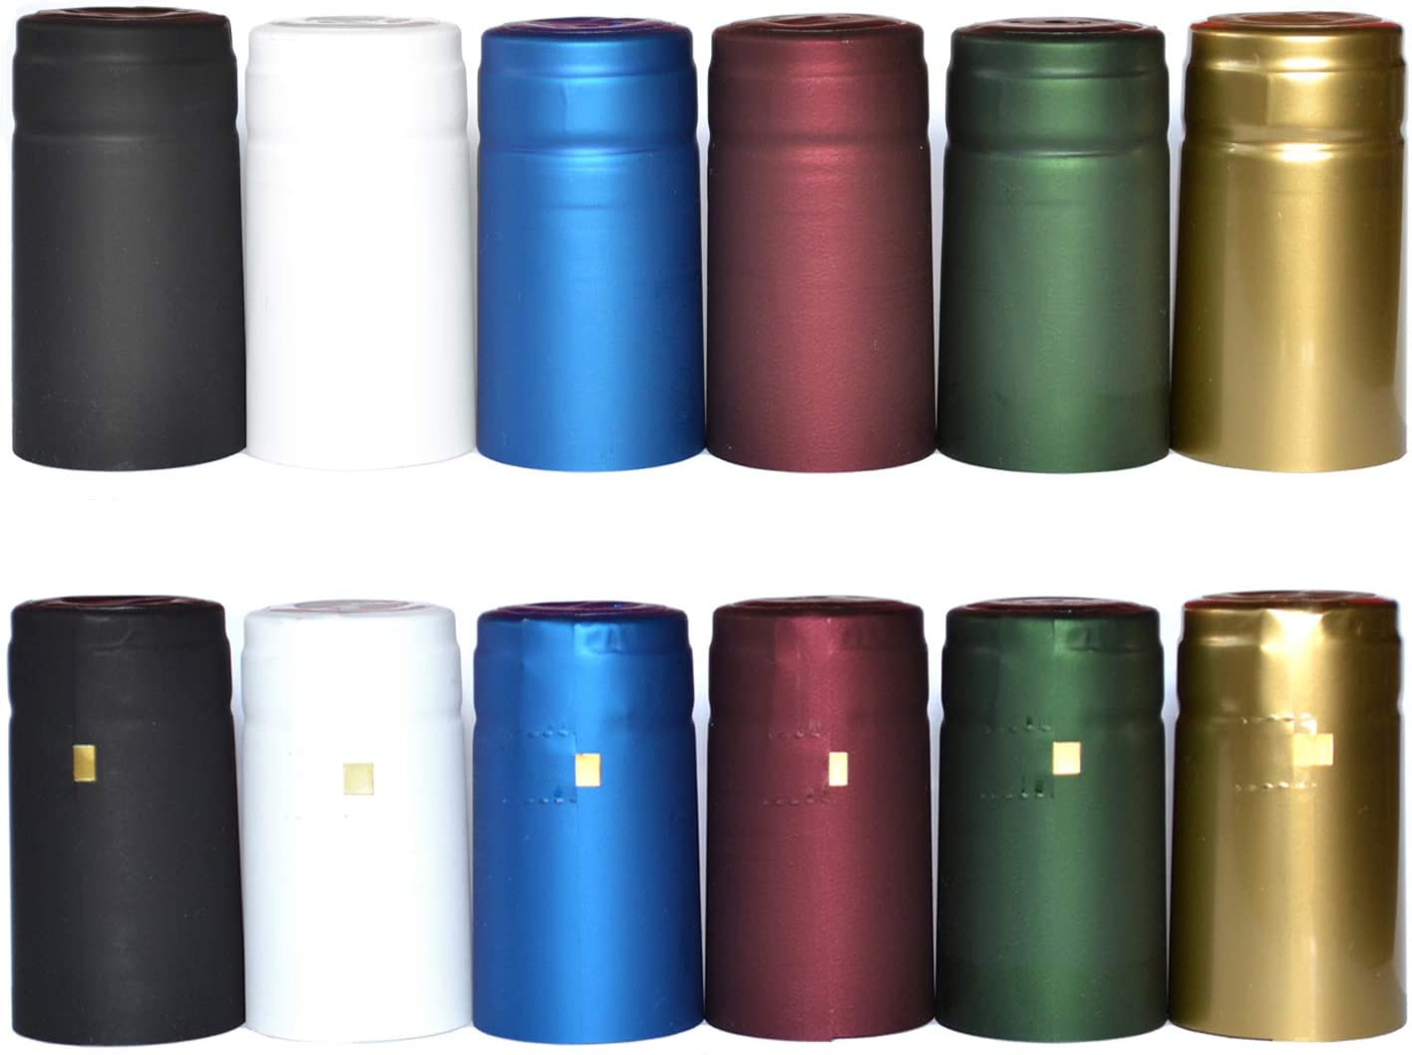 100x Wine Bottle Wraps Heat Shrink PVC Shrinking Sleeves Covers 30m Golden